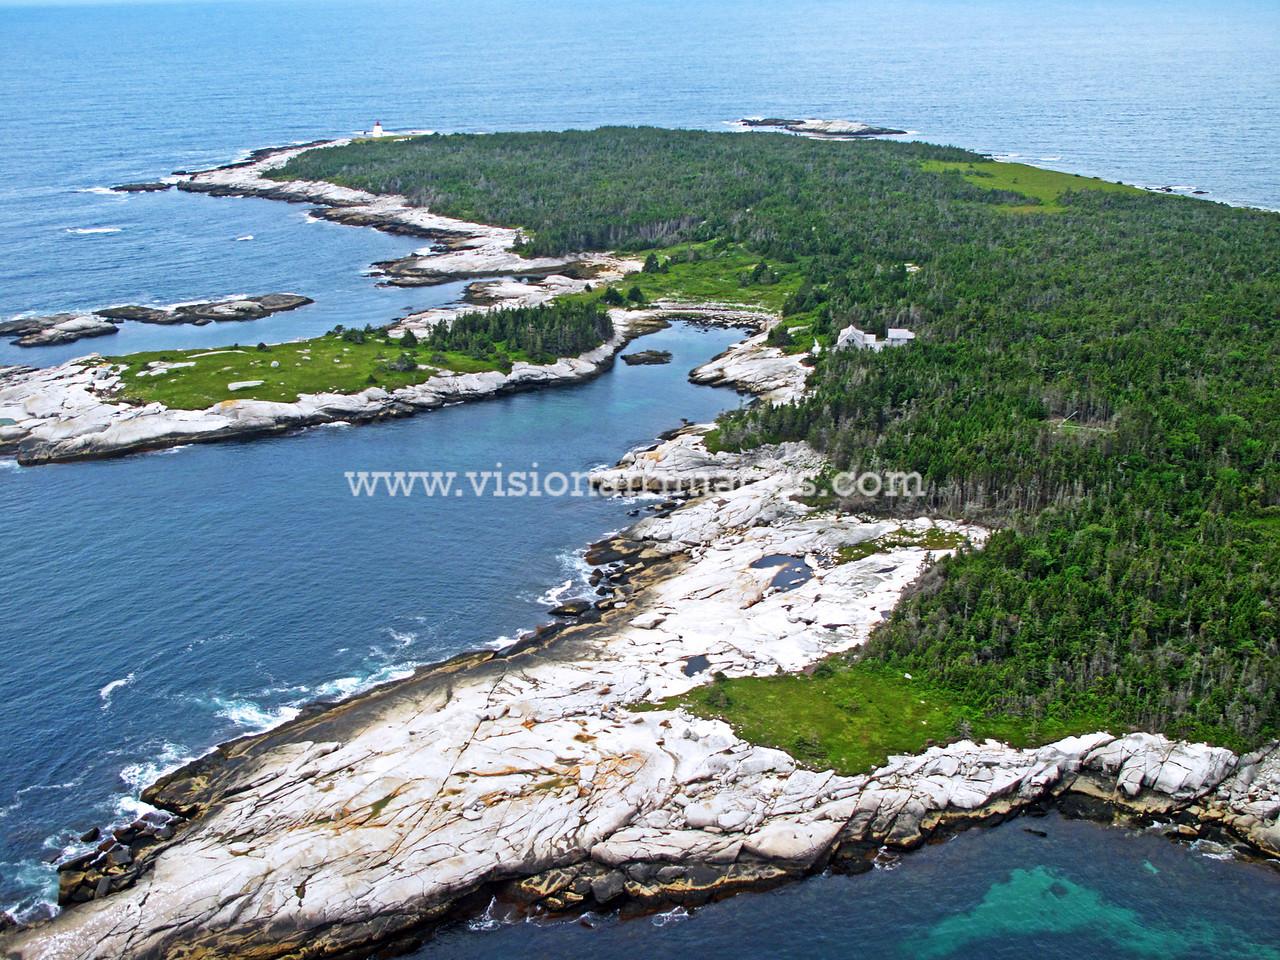 Betty's Island, Betty's Island Lighthouse, Propect, Lwr. Prospect, Lighthouse Route, Nova Scotia, Canada